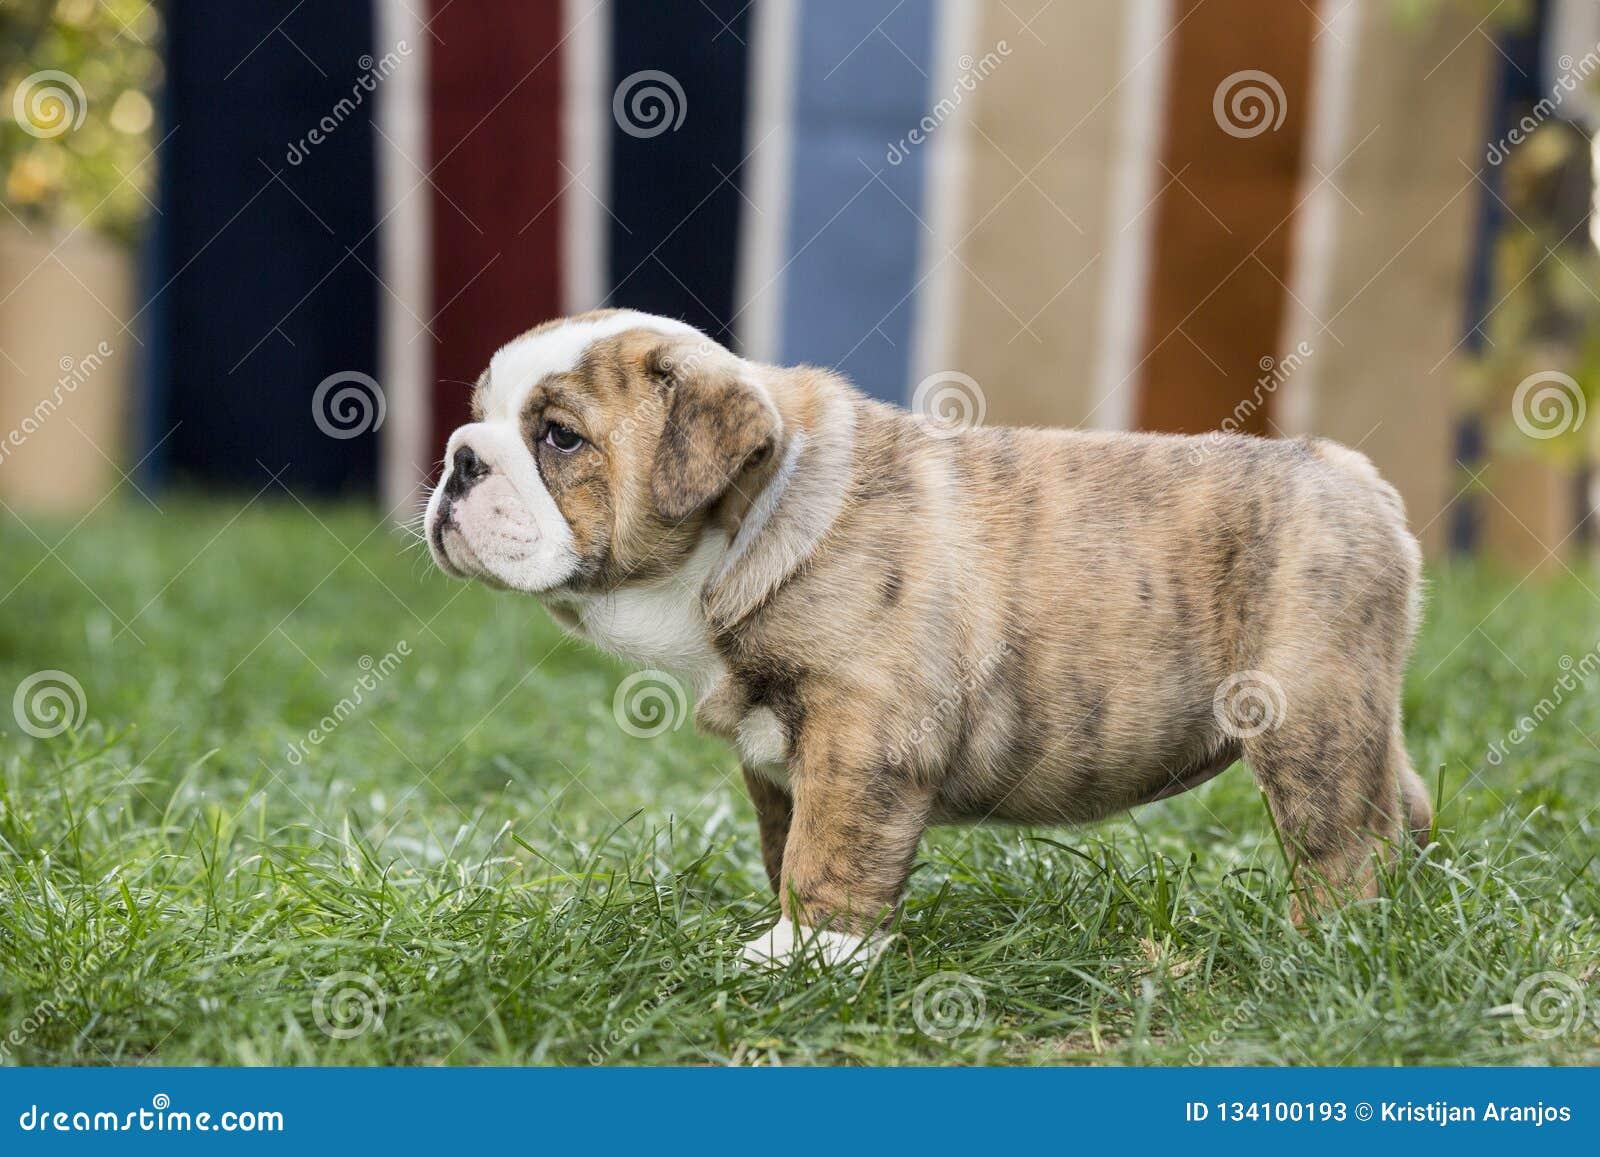 English Bulldog Puppies Backyard Playing Young Dogs Stock Image Image Of Funny Bulldog 134100193